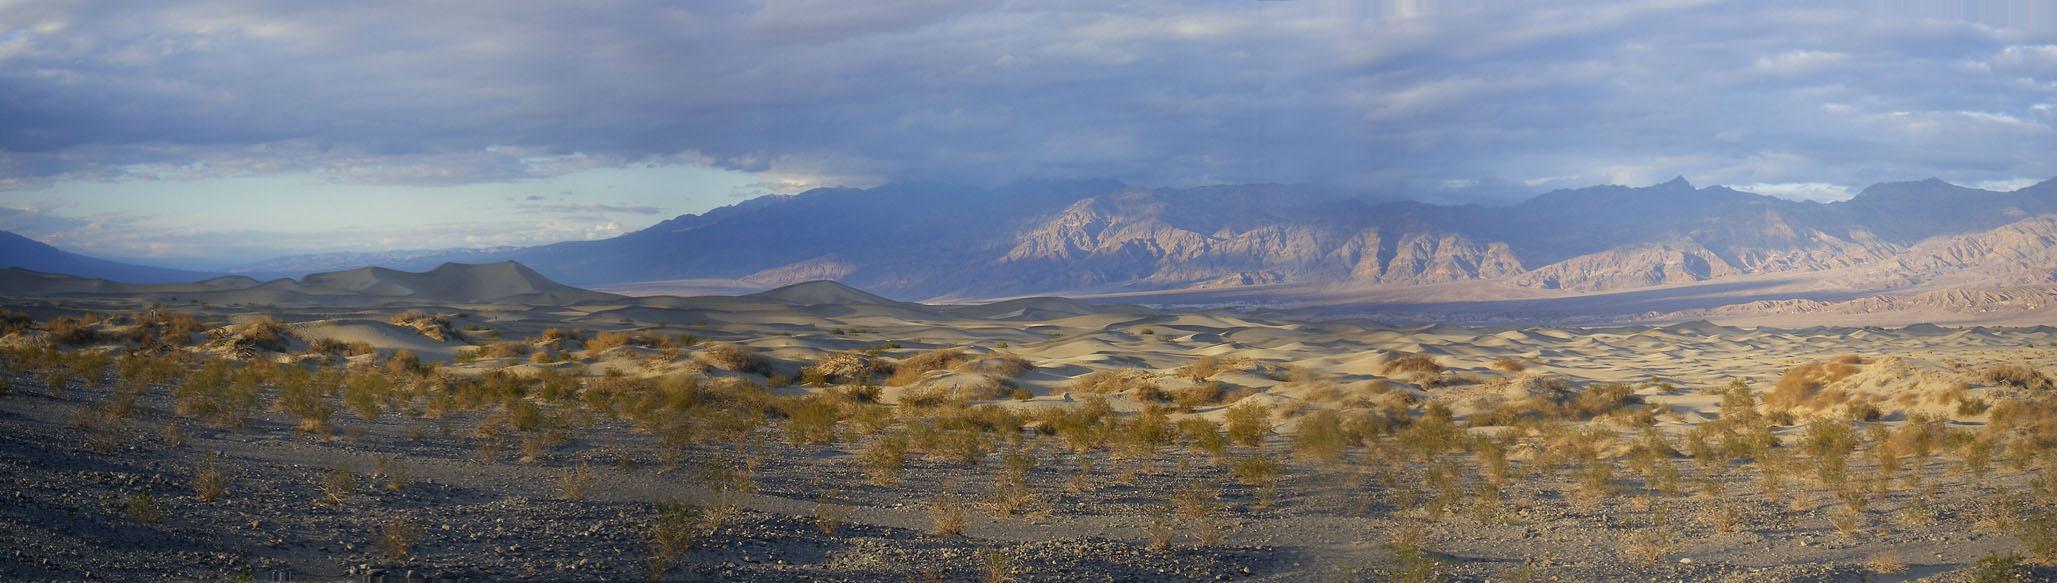 Desert_de_sable_de_la_vallee_de_la_mort